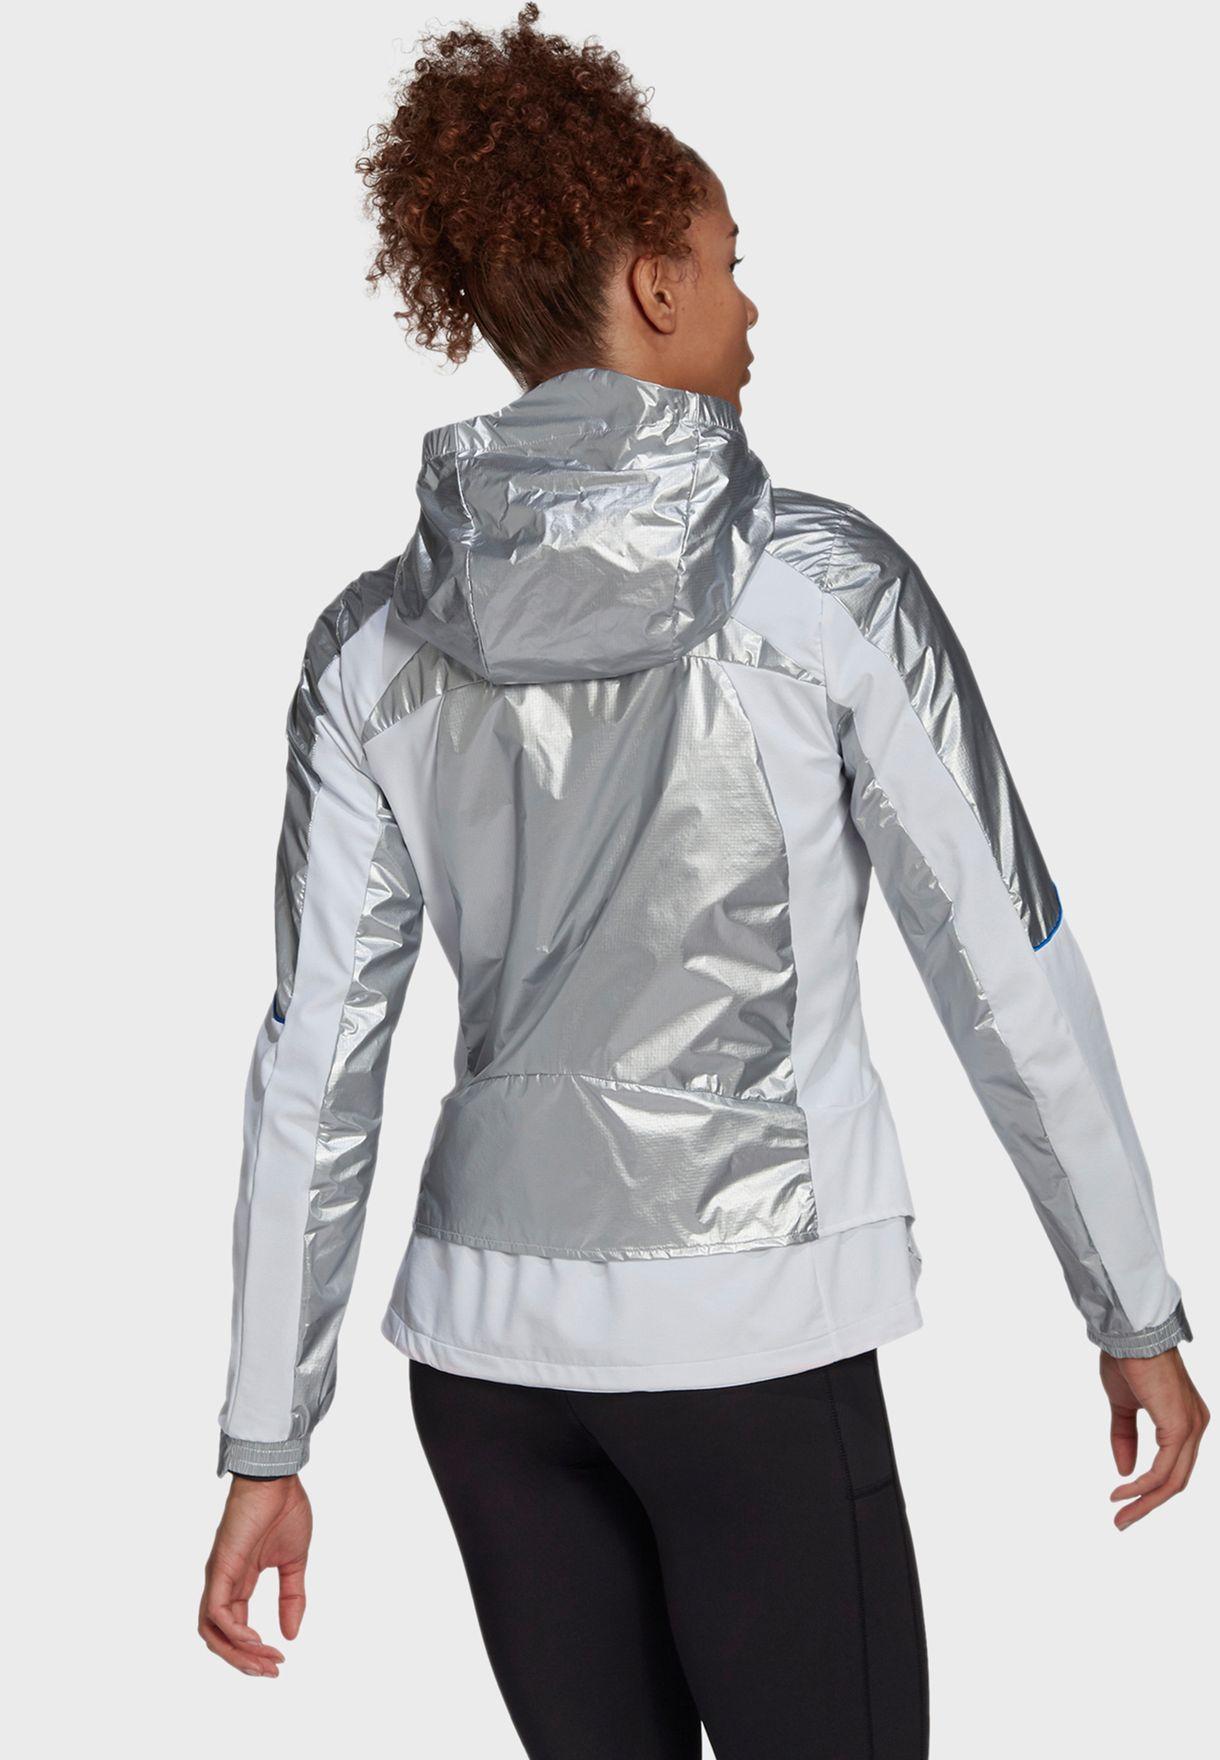 Marathon Space Race Jacket